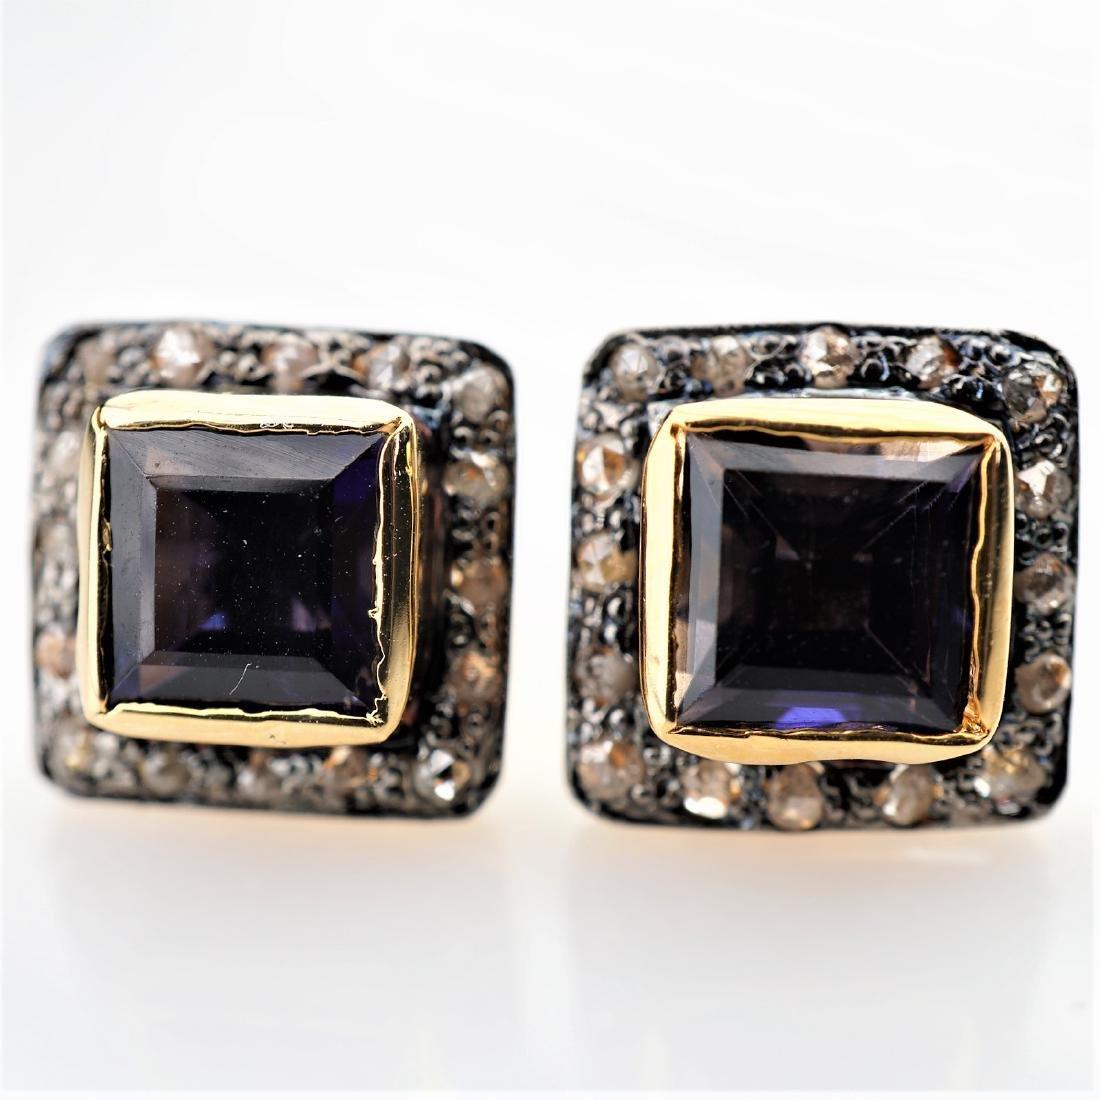 2.50 CTTW Iolite Earrings with Diamonds